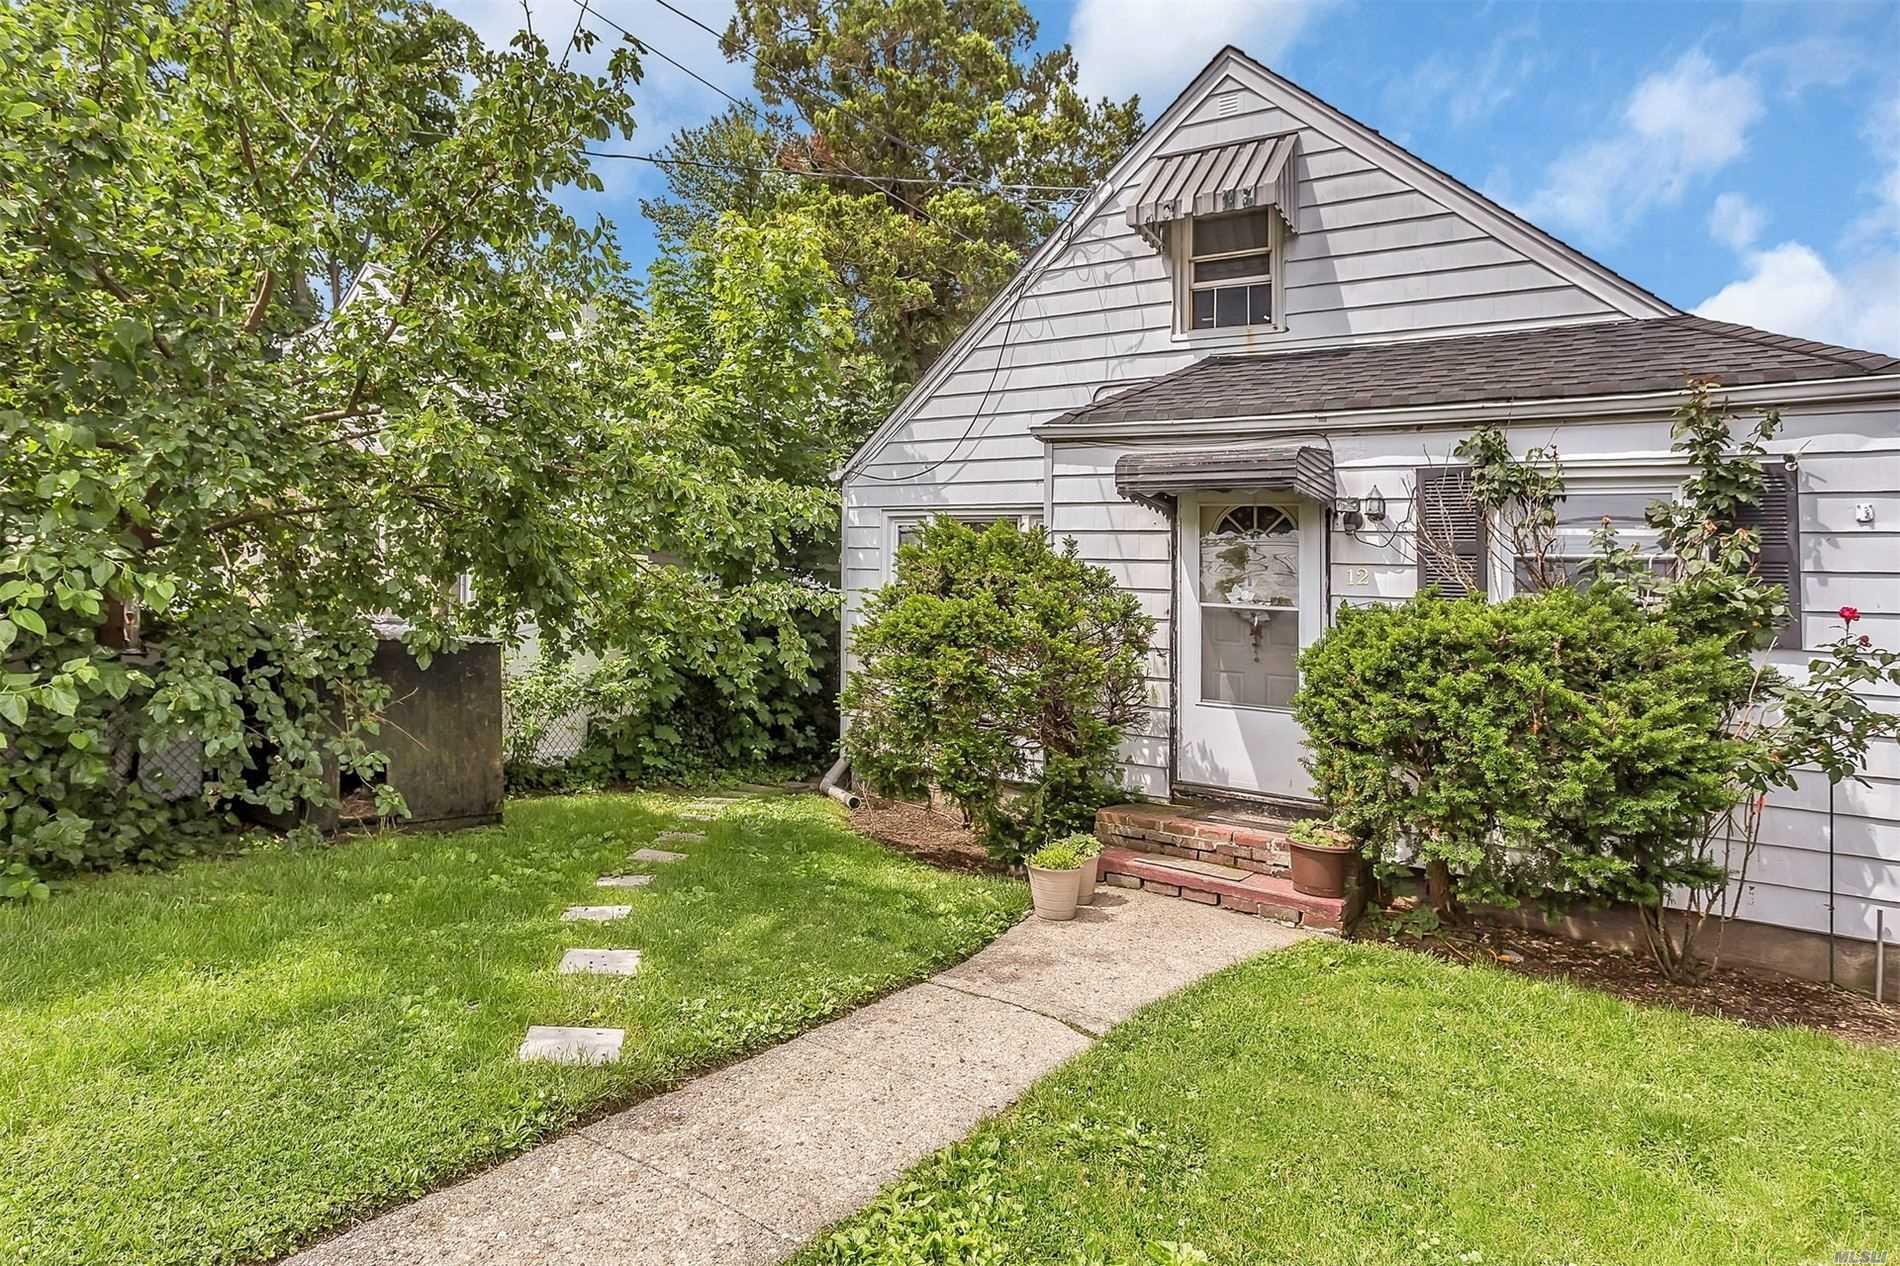 12 Spruce St - W. Hempstead, New York